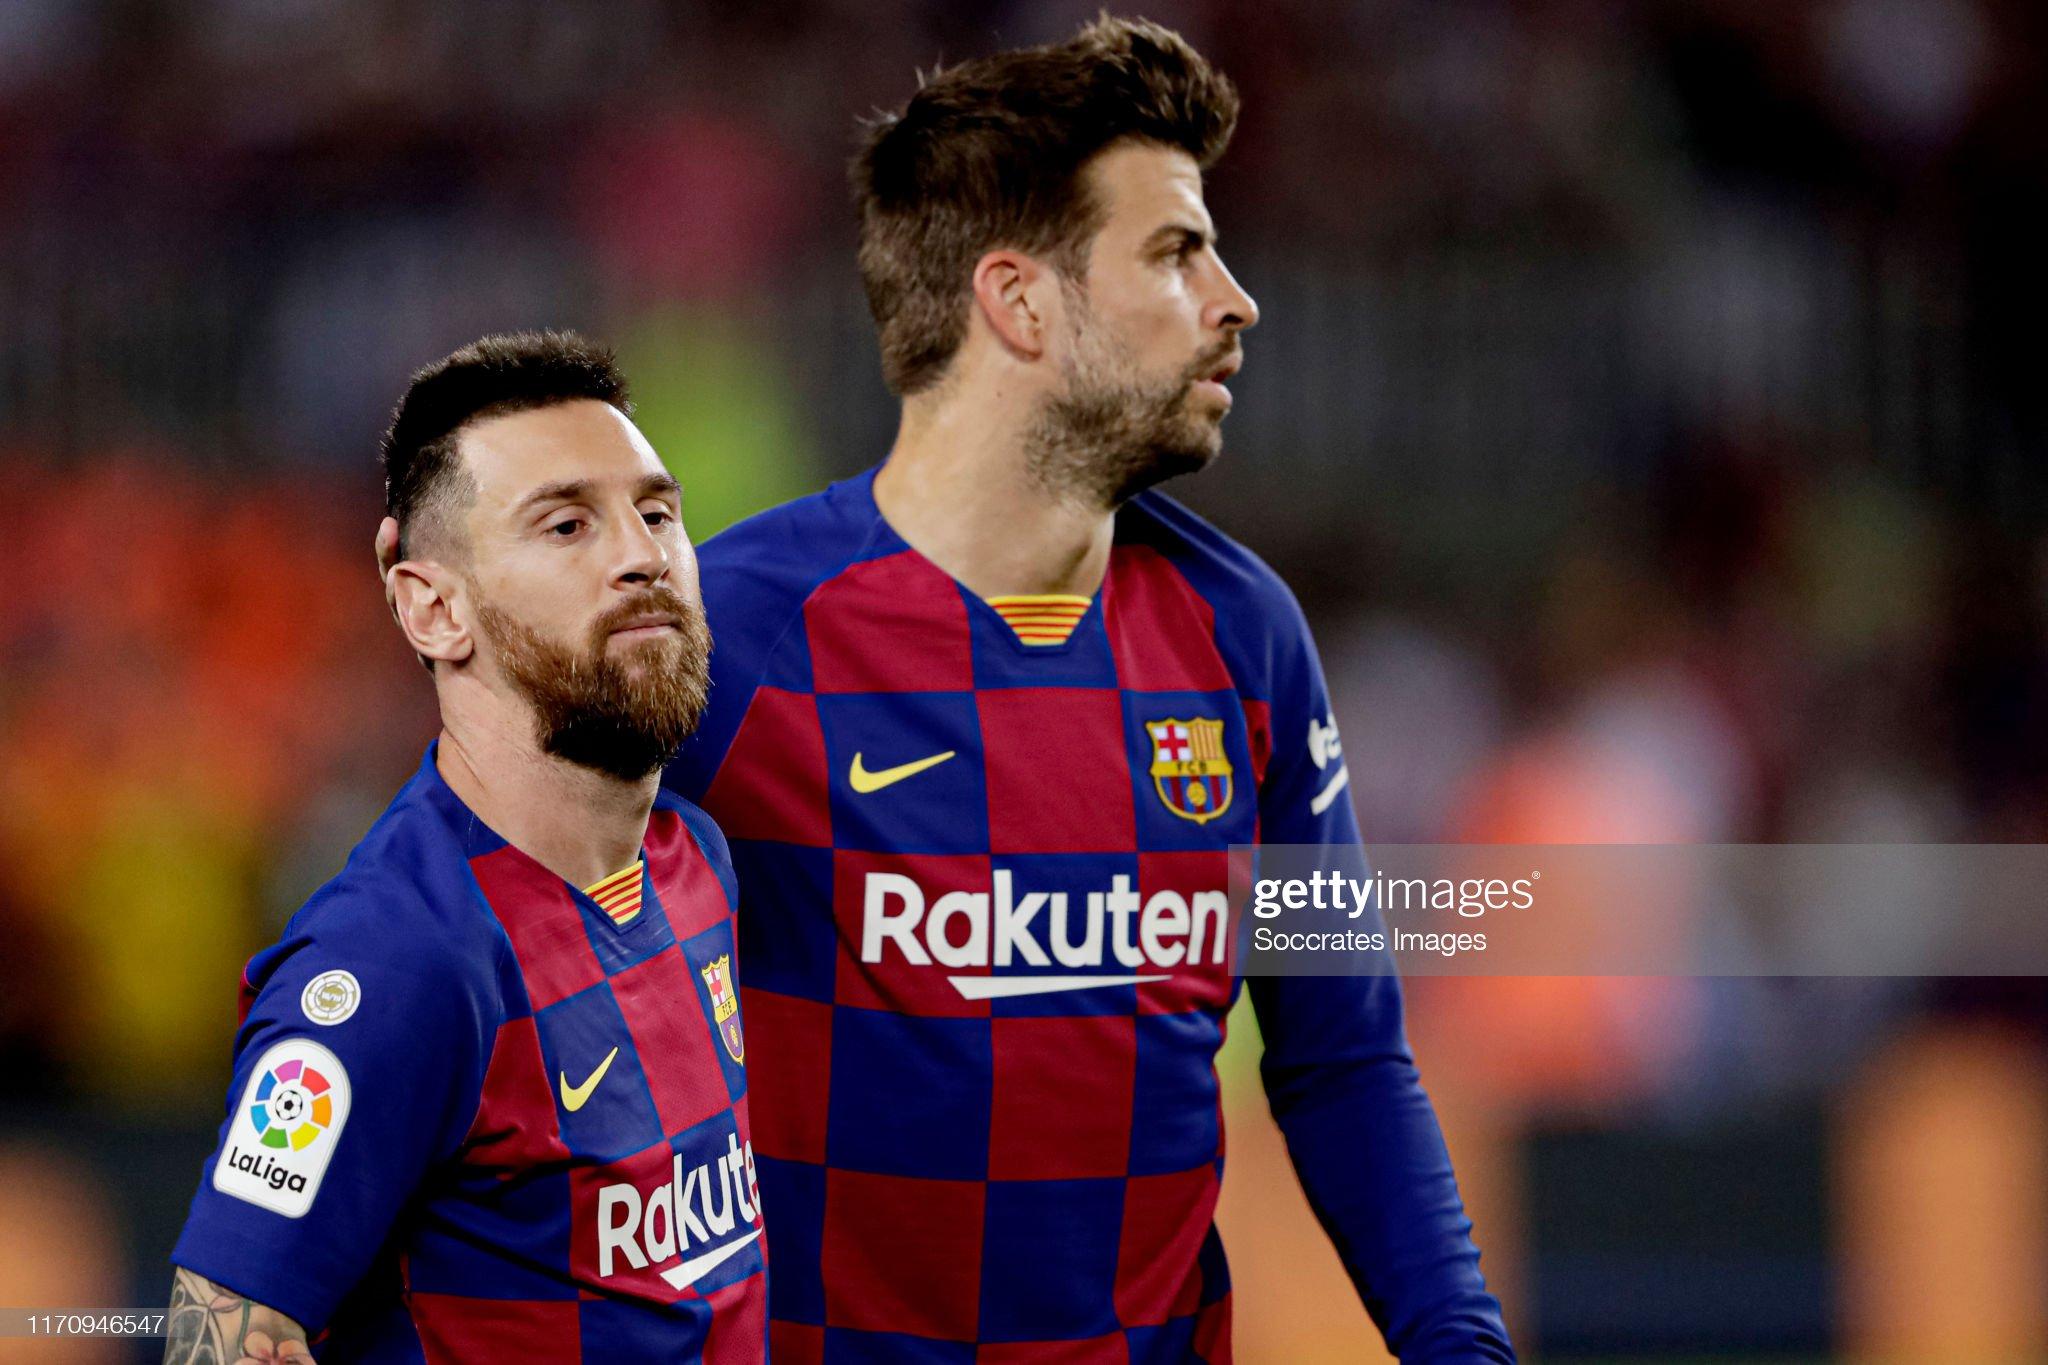 صور مباراة : برشلونة - فياريال 2-1 ( 24-09-2019 )  Lionel-messi-of-fc-barcelona-gerard-pique-of-fc-barcelona-during-the-picture-id1170946547?s=2048x2048